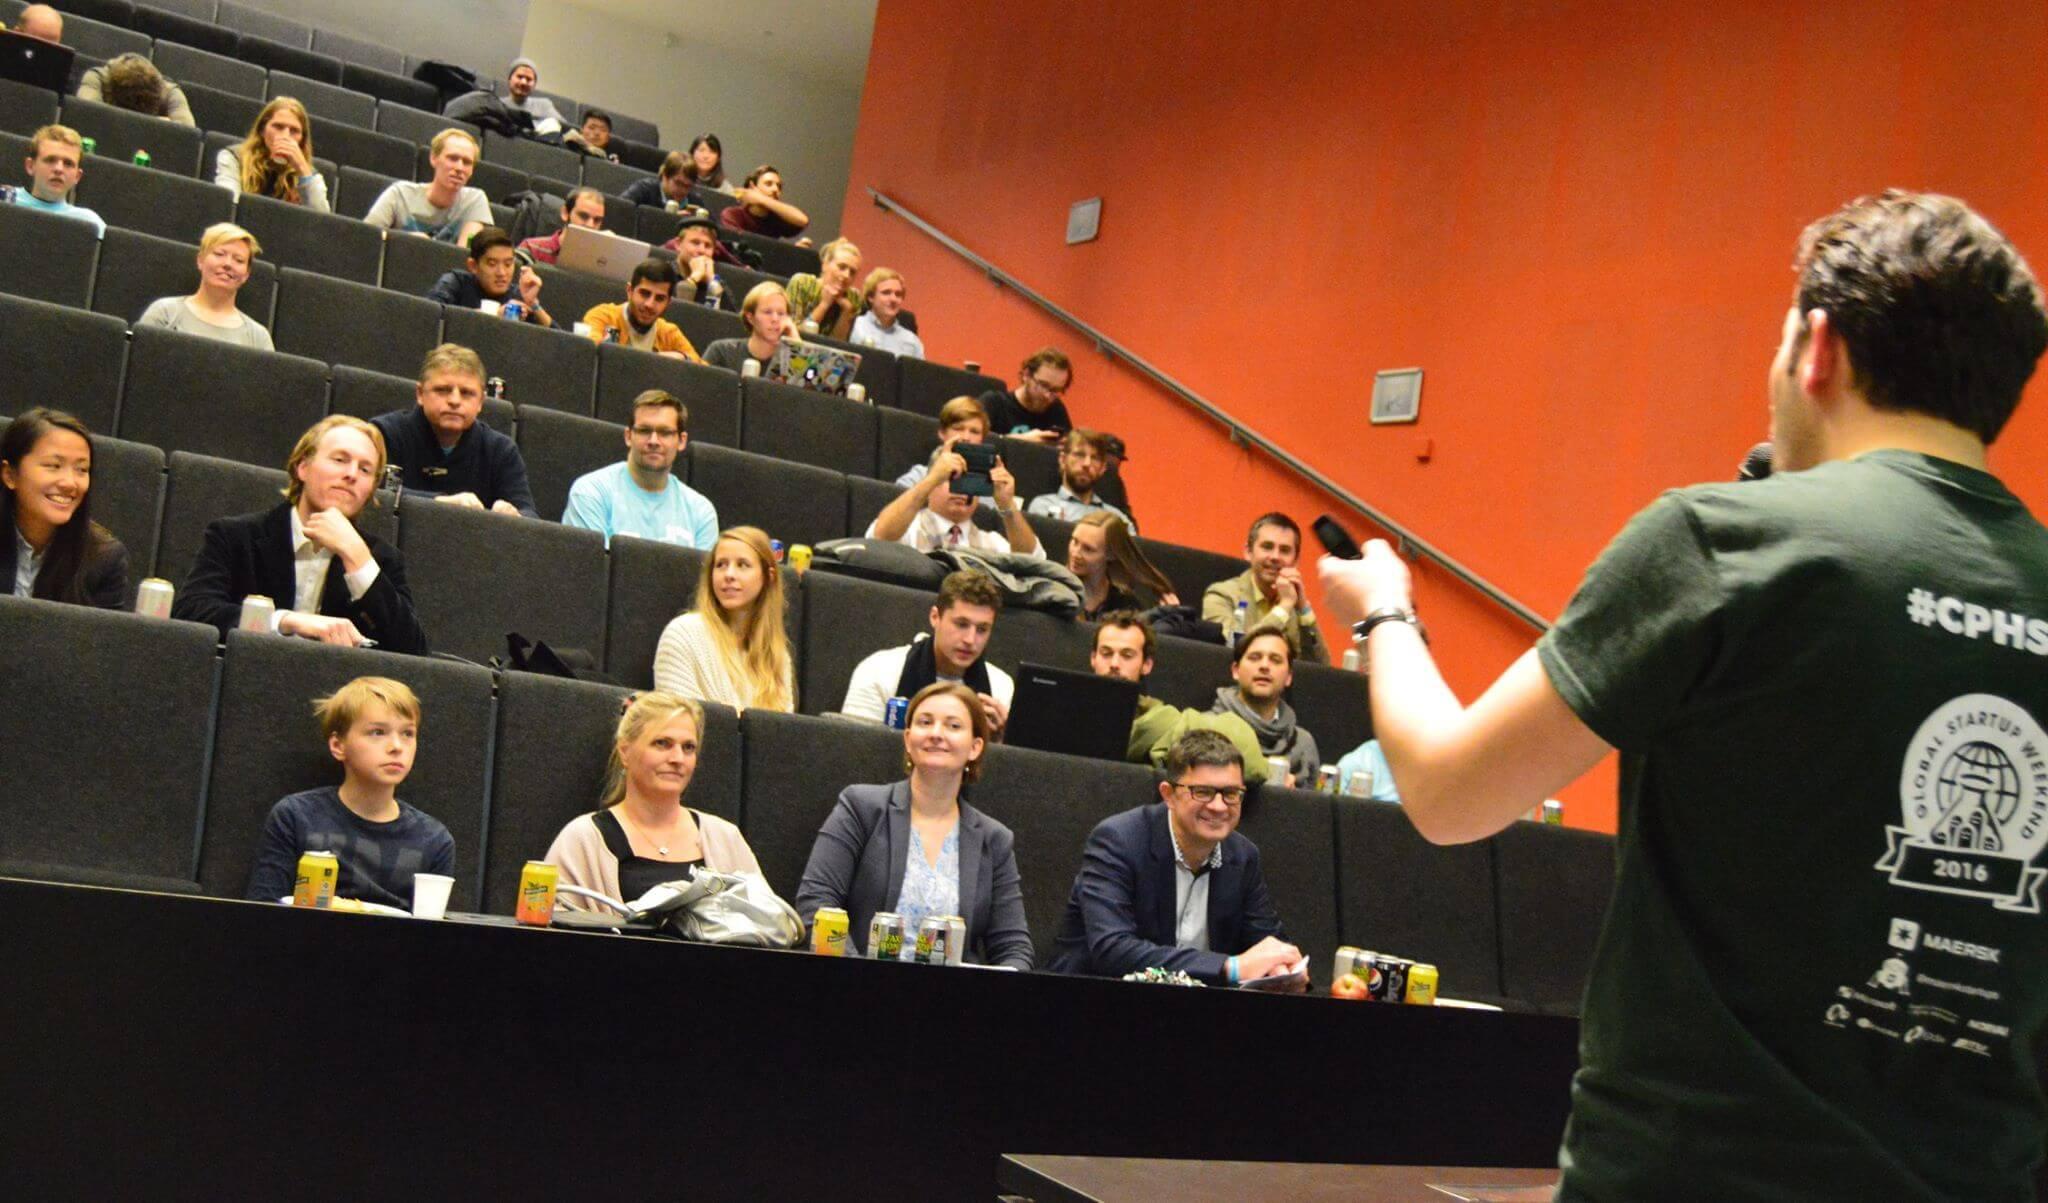 Audience of Startup Weekend Copenhagen from the perspective of moderator Serhat Kaya